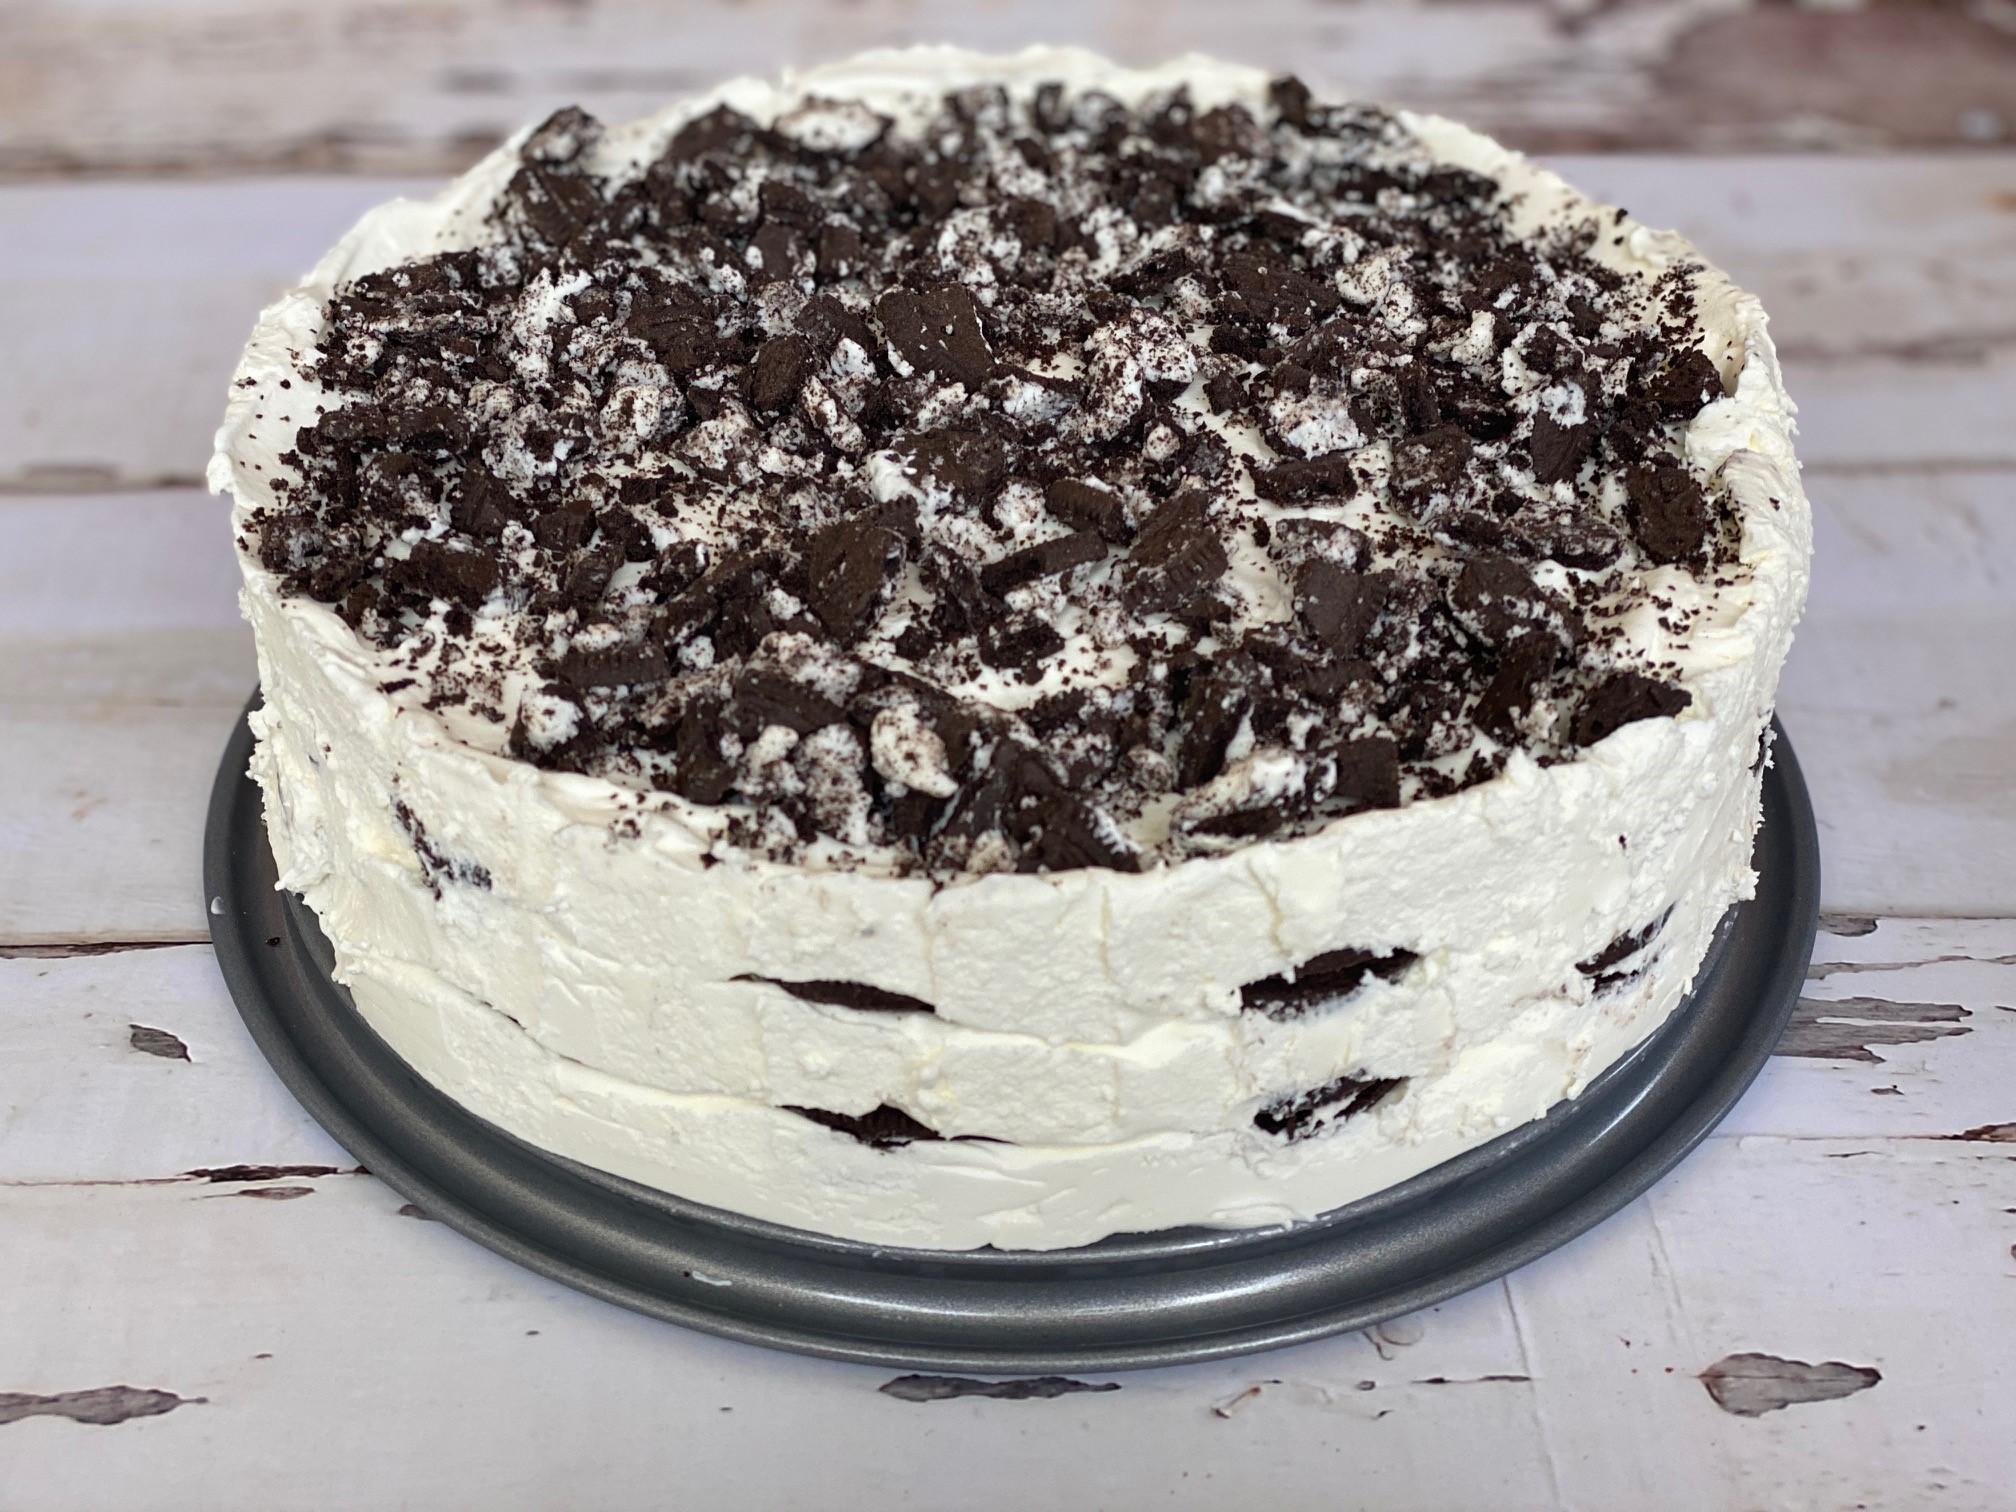 Cookies and Cream Icebox Cake